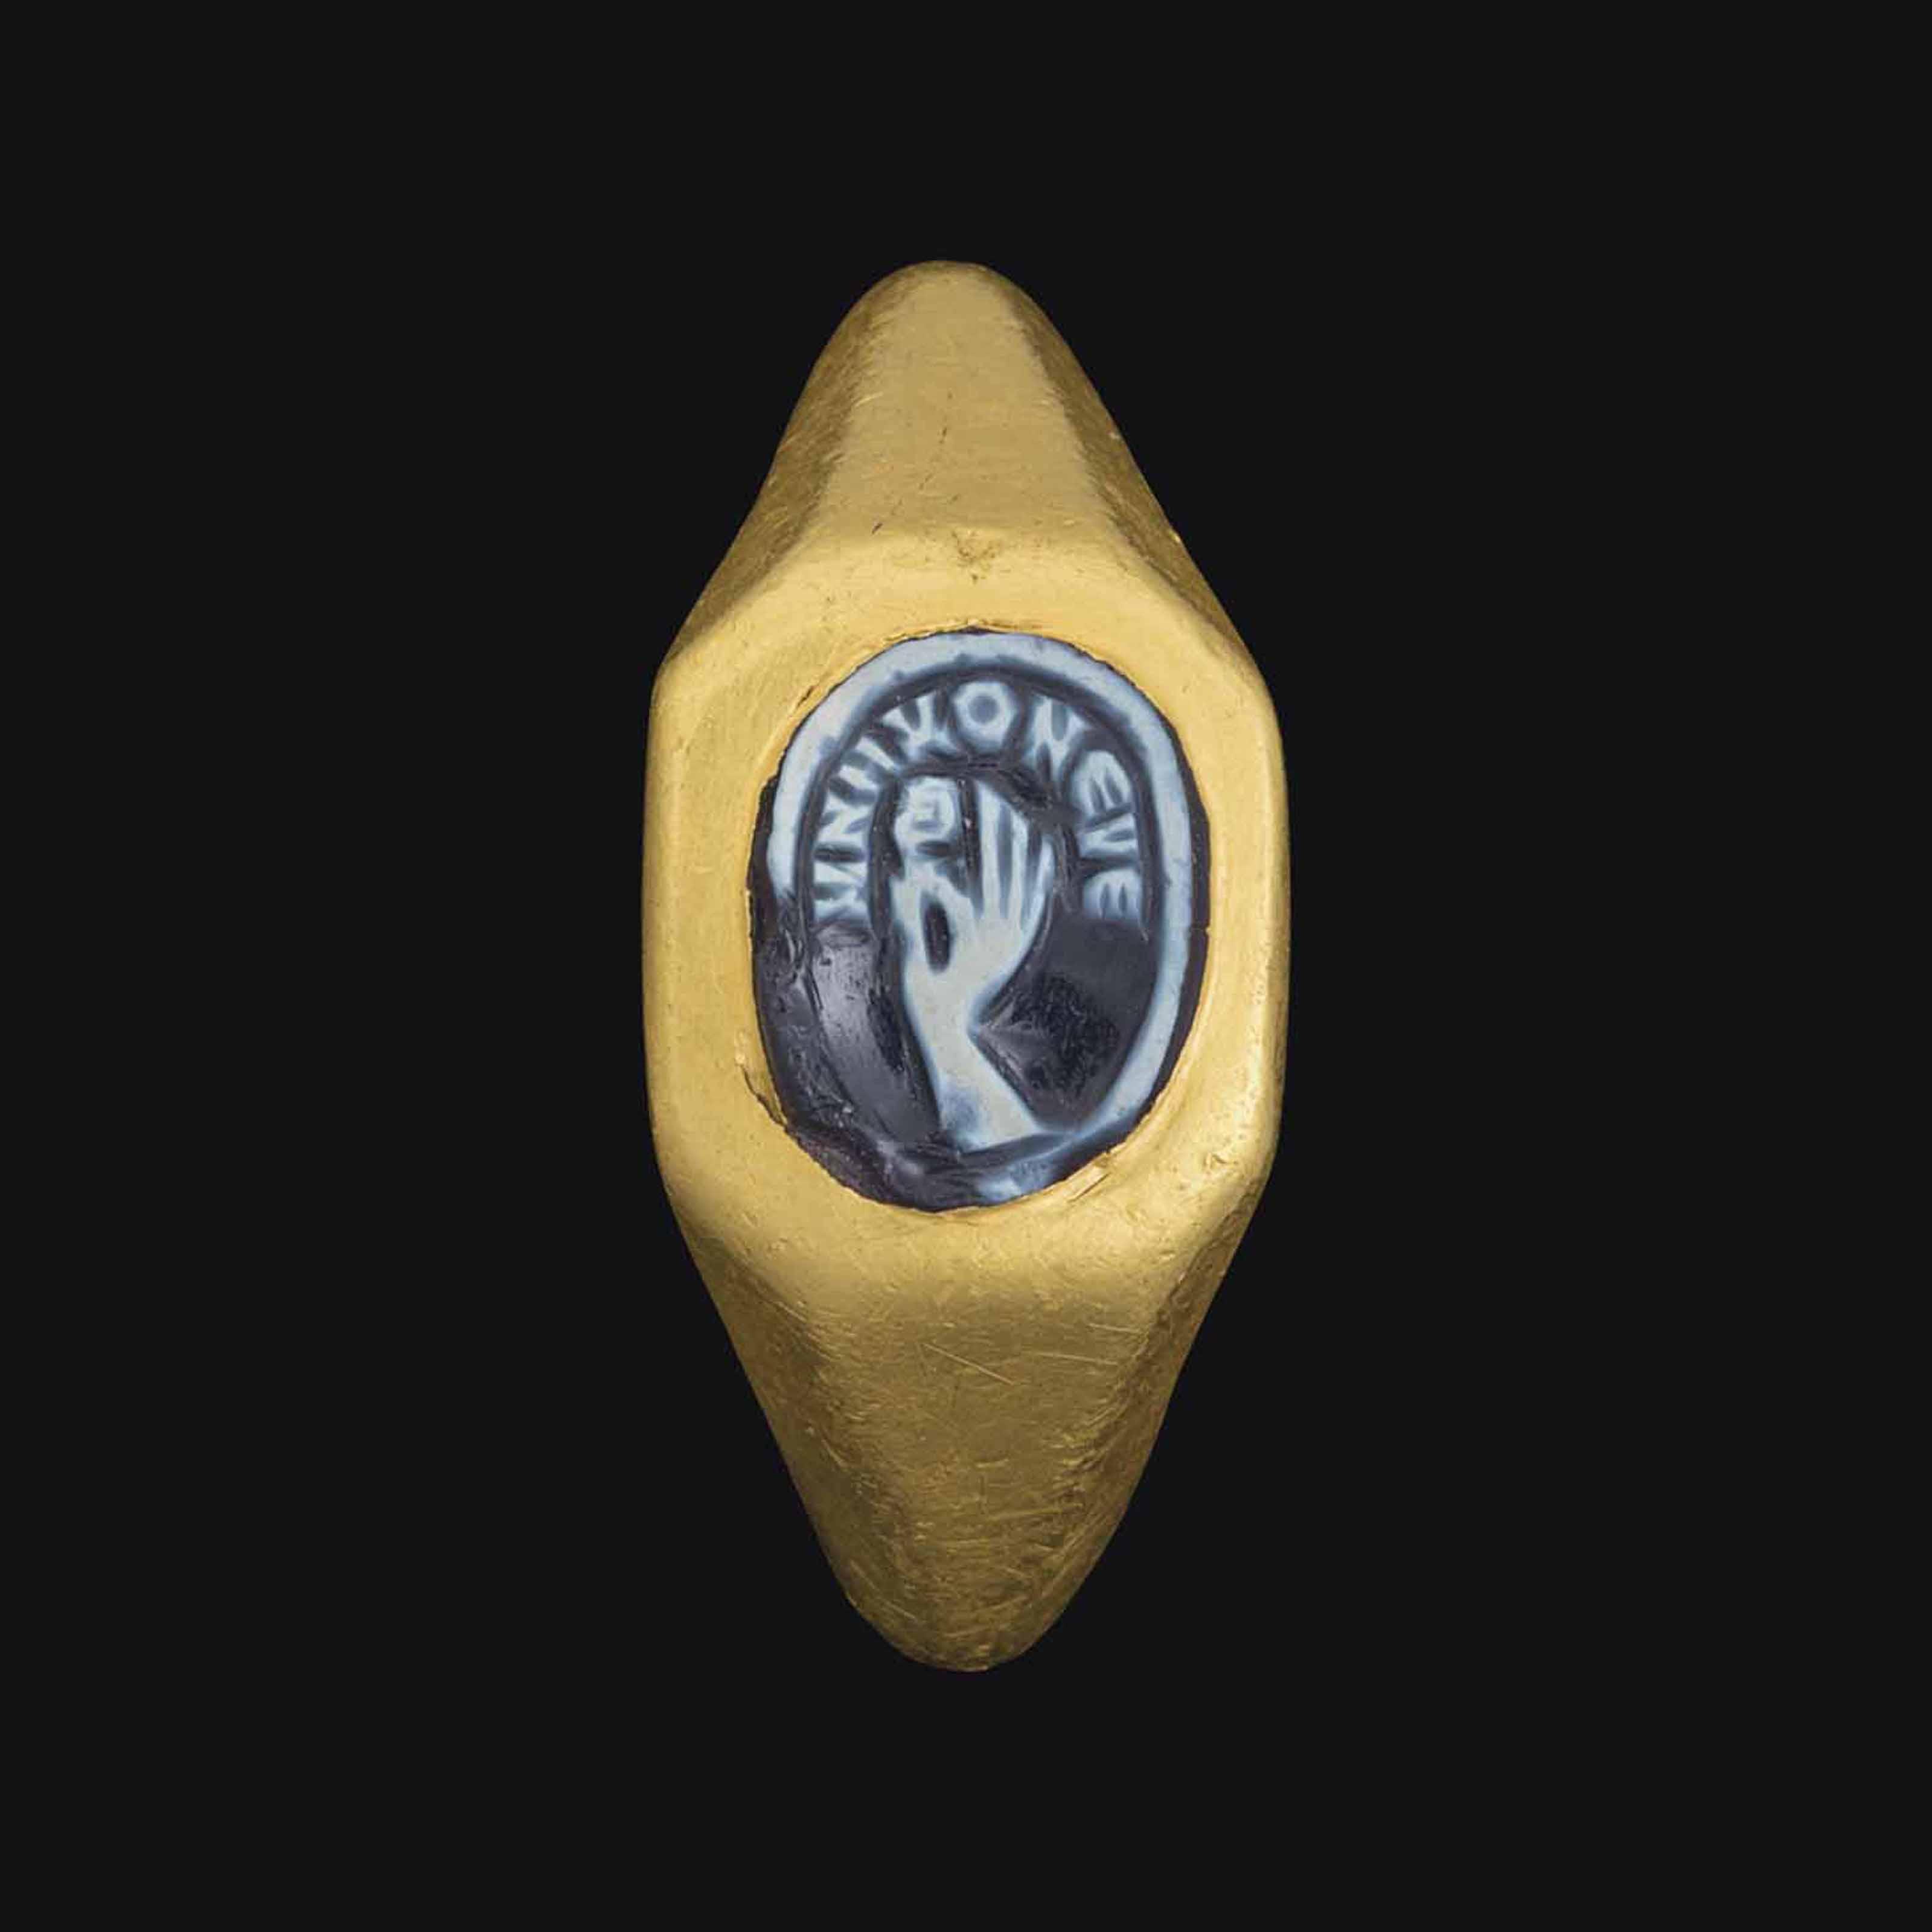 A ROMAN GOLD AND ONYX CAMEO FI